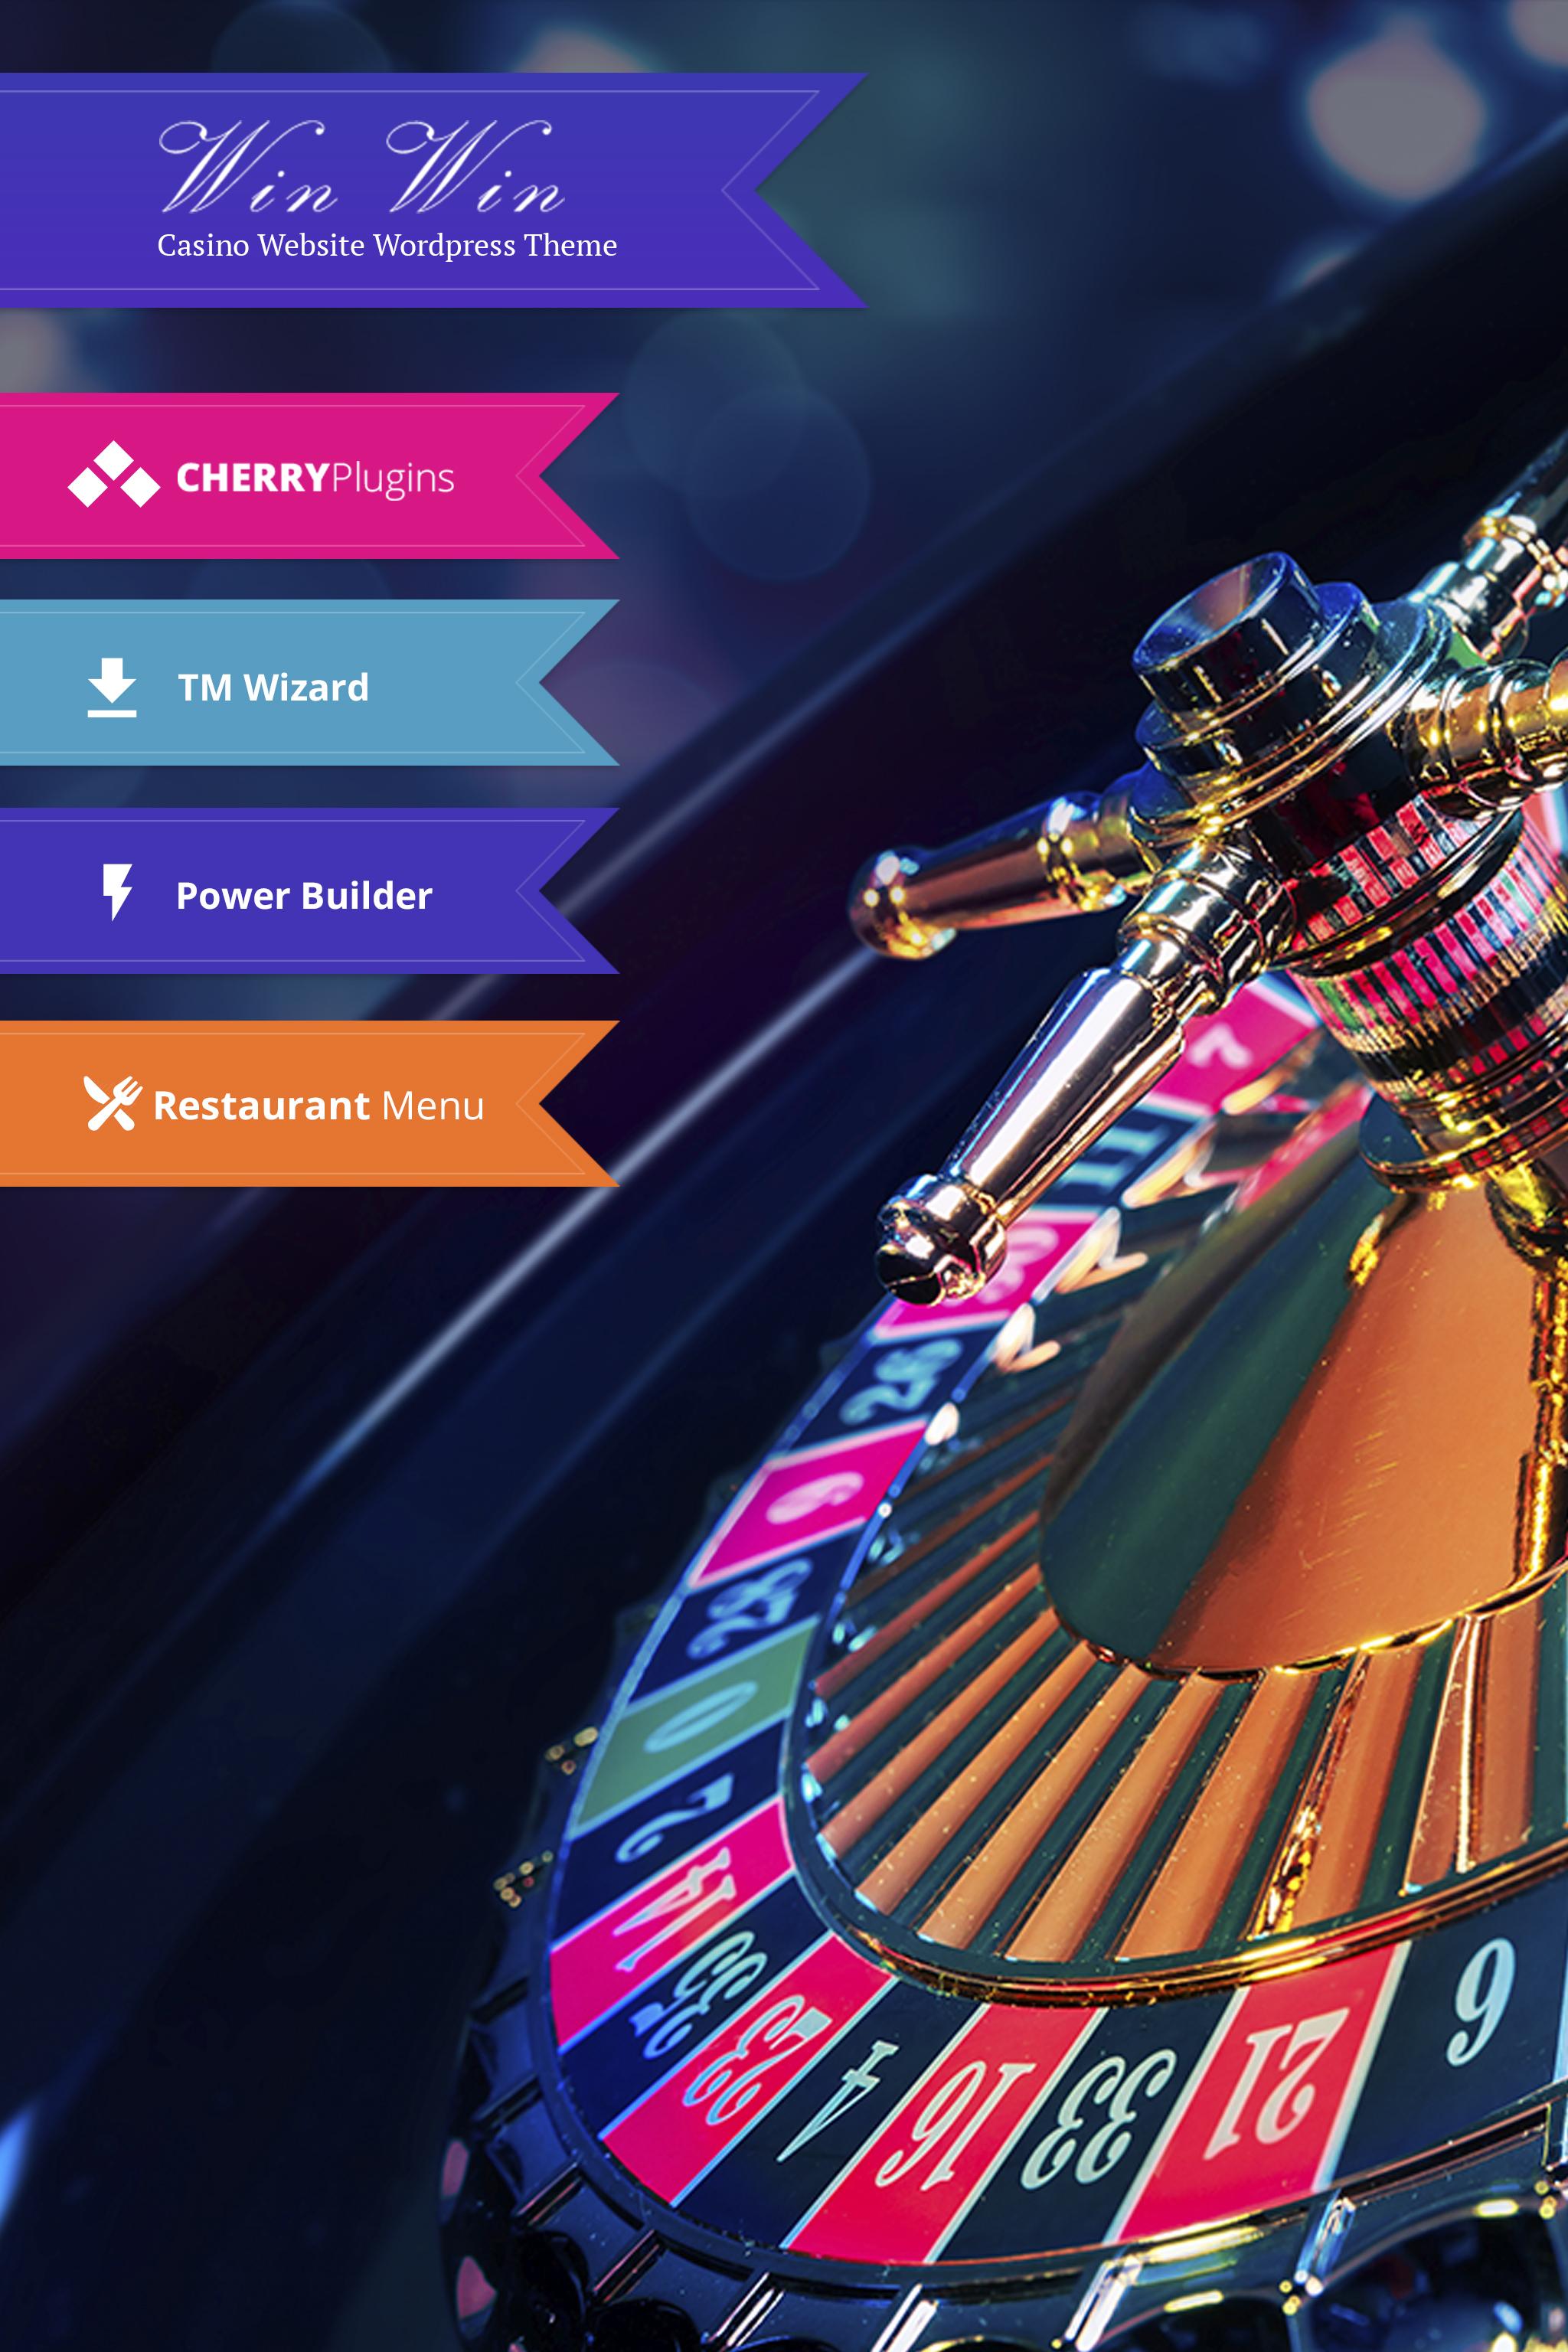 WinWin - Casino Website WordPress Theme WordPress Theme - screenshot